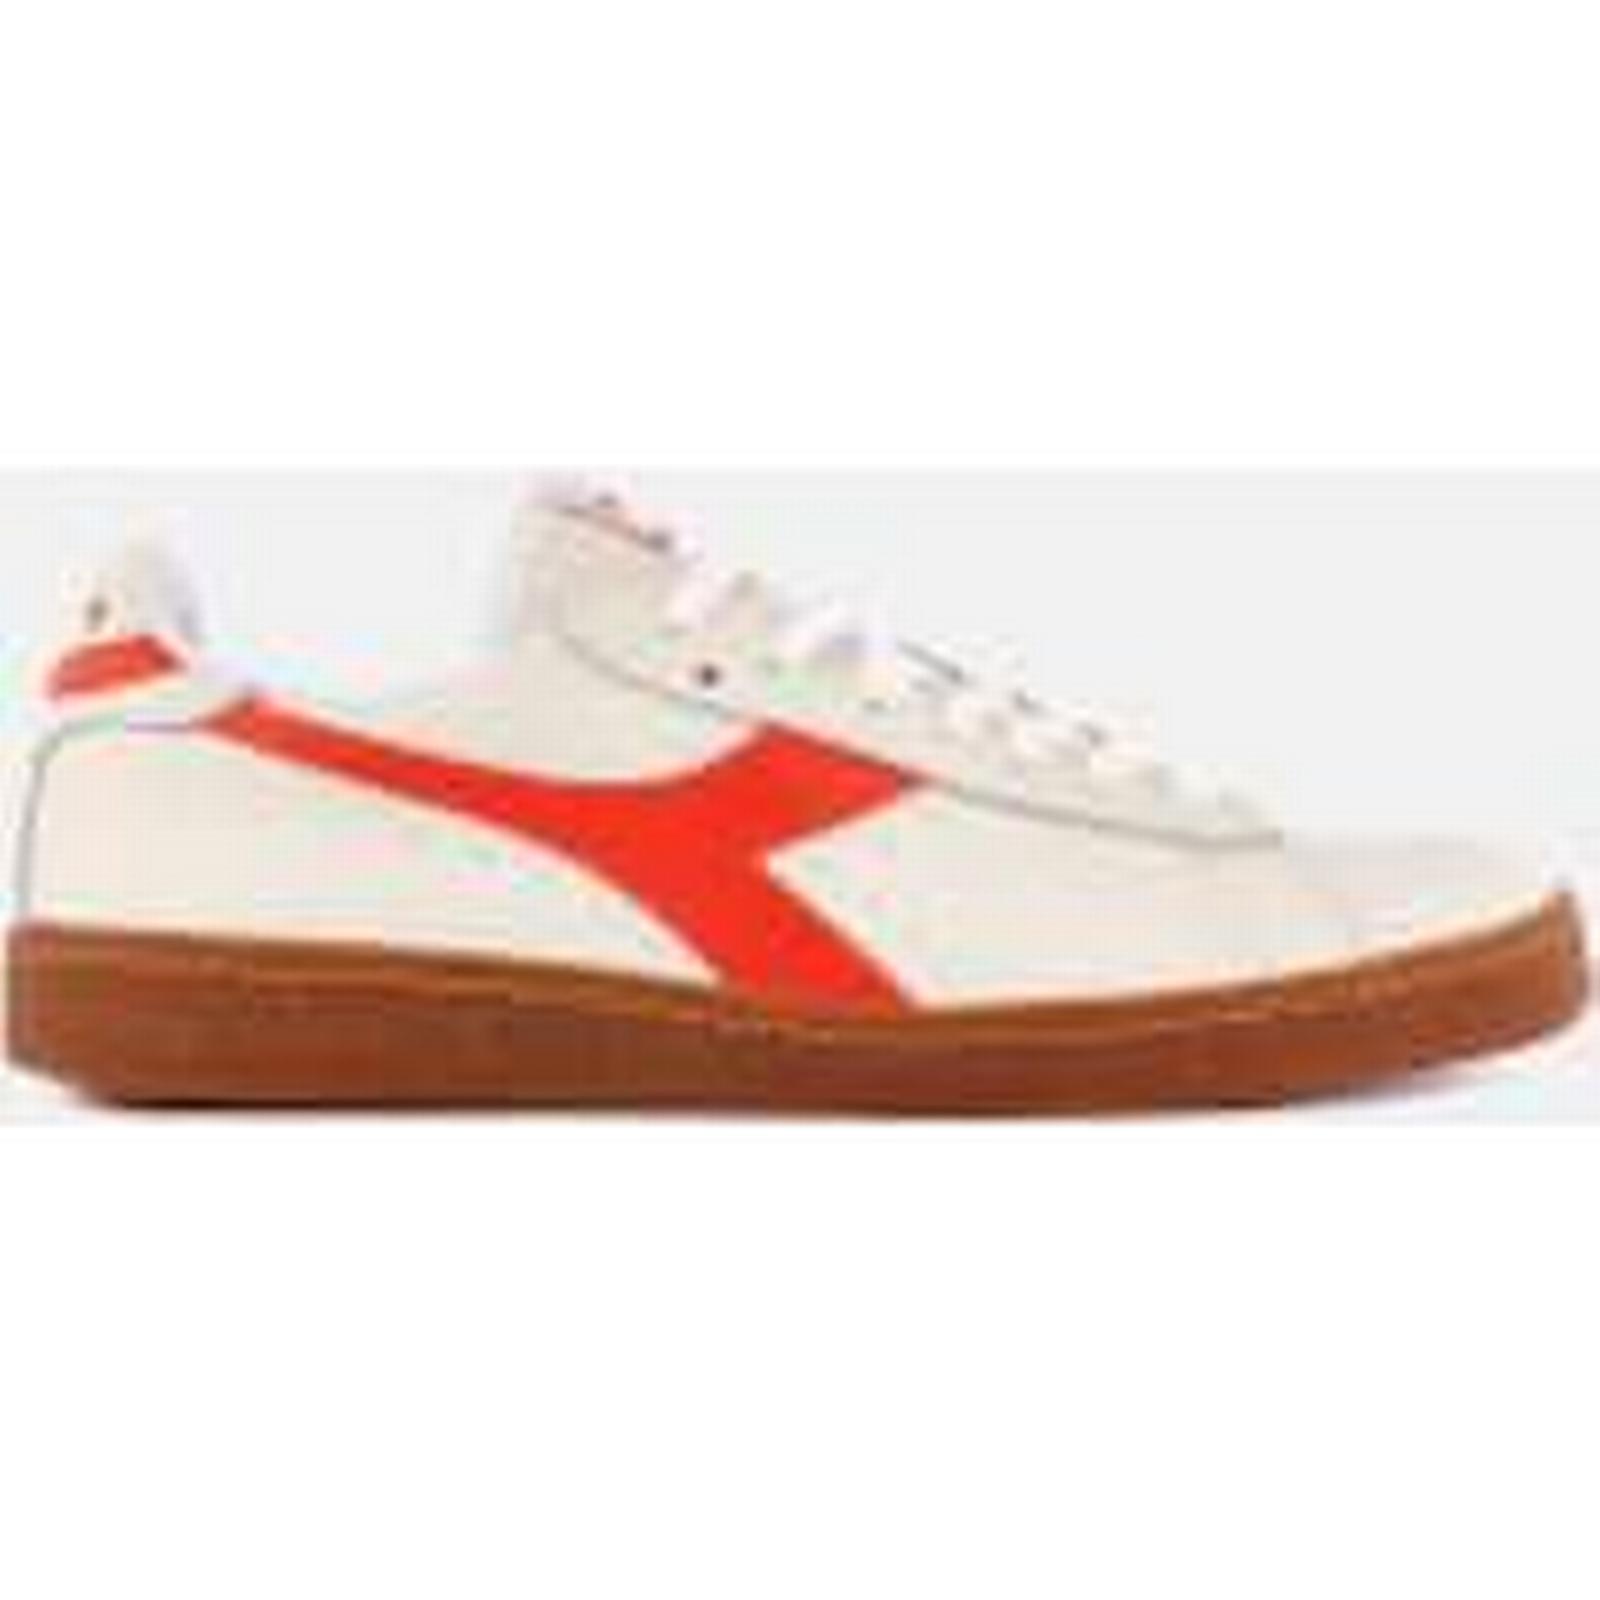 Diadora Men's Game Low L Grained Leather - Trainers - Super White/Tangerine - Leather UK 7 - White 7235e4